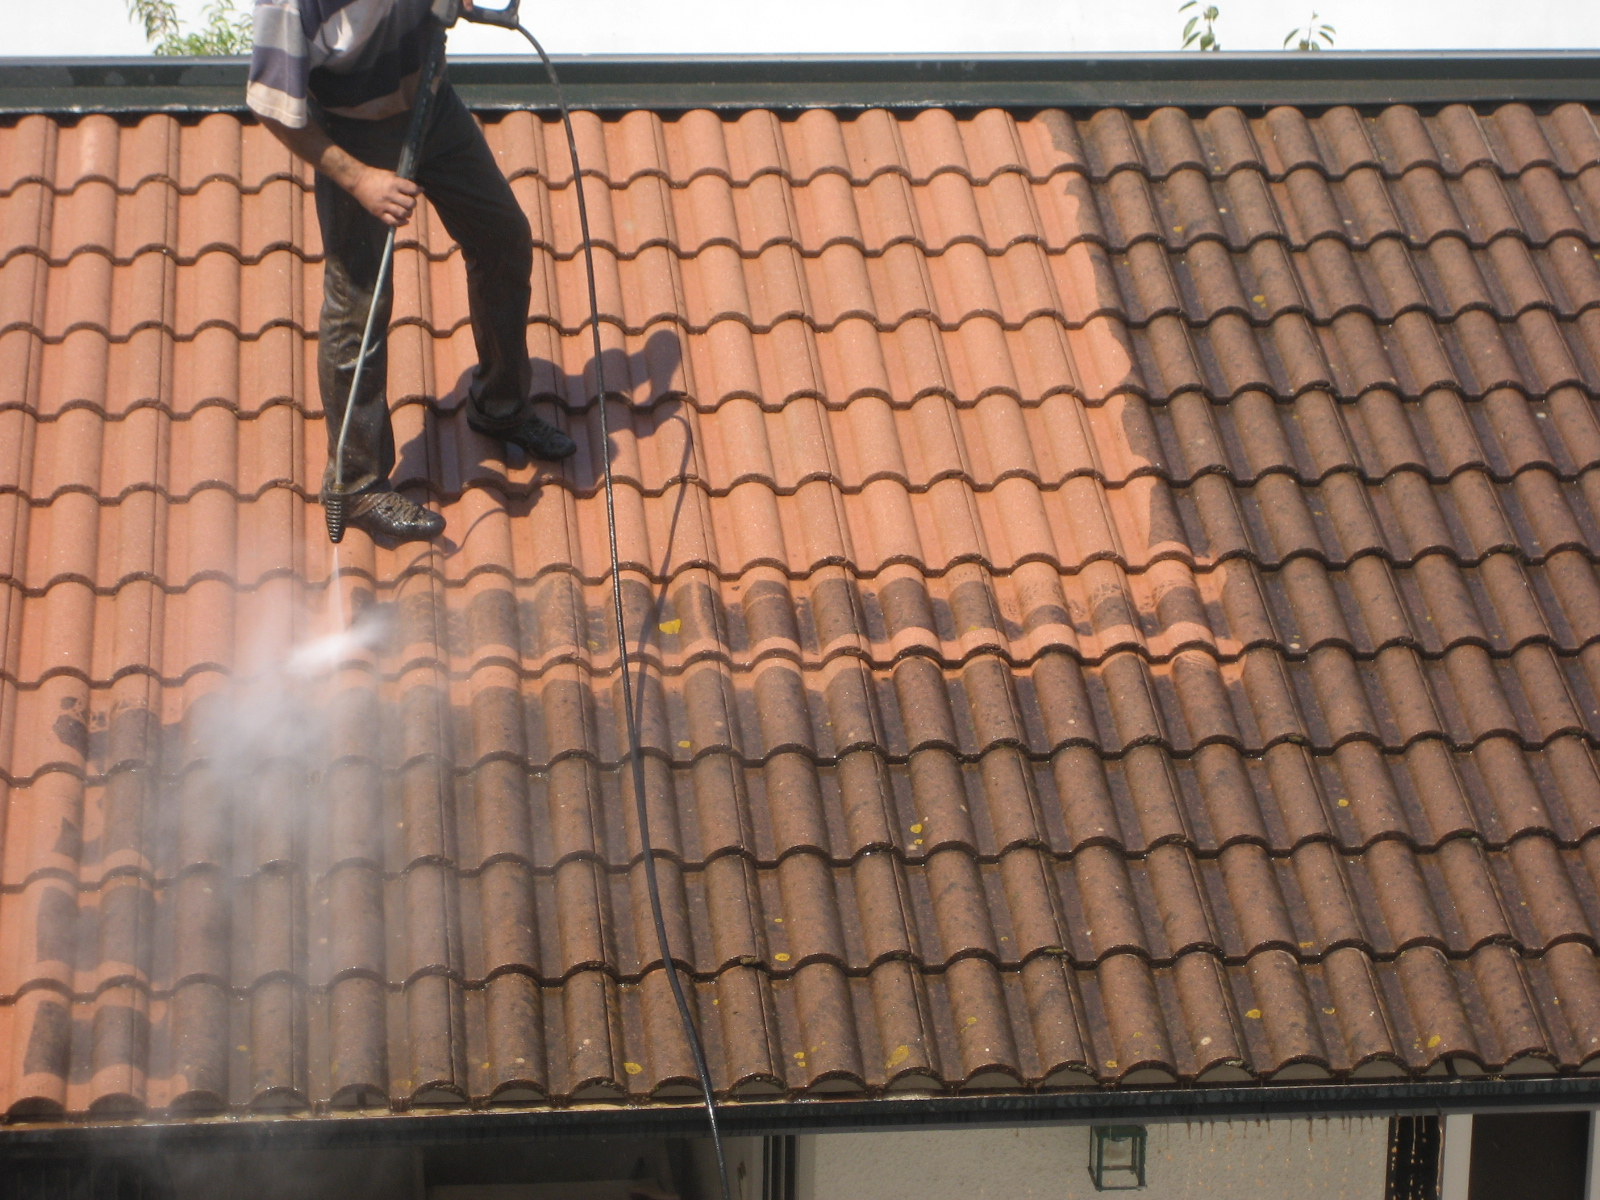 comment nettoyer sa toiture en tuile